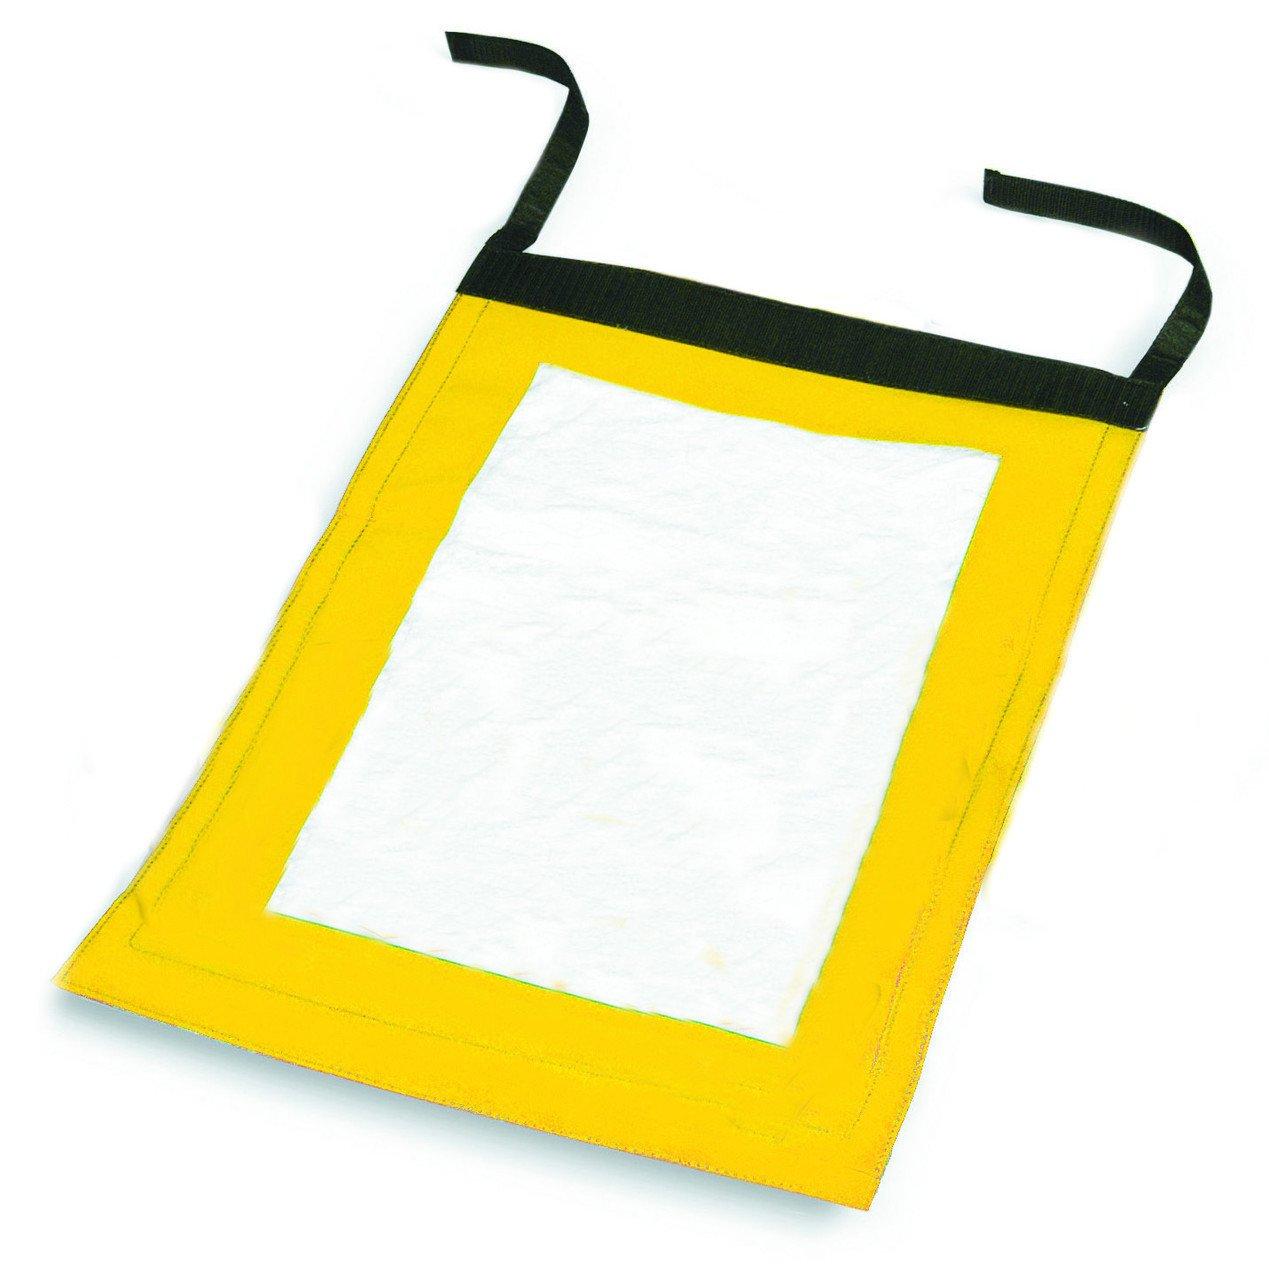 Enpac 4702-YE Drip Sentinel Hose Wrap, Fits 1-1/2'' to 3'' Hose, Small, Yellow